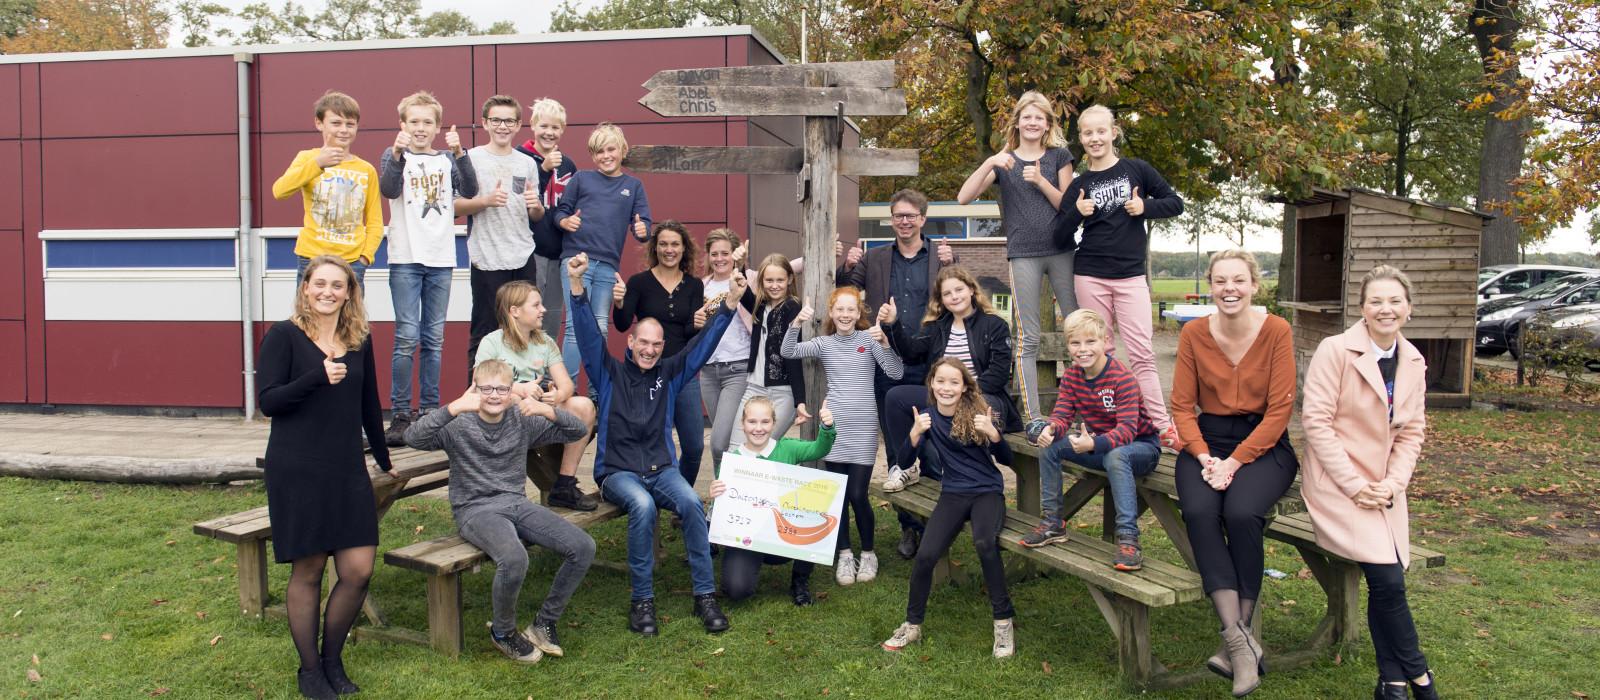 Daltonschool Nettelhorst wint E-waste Race